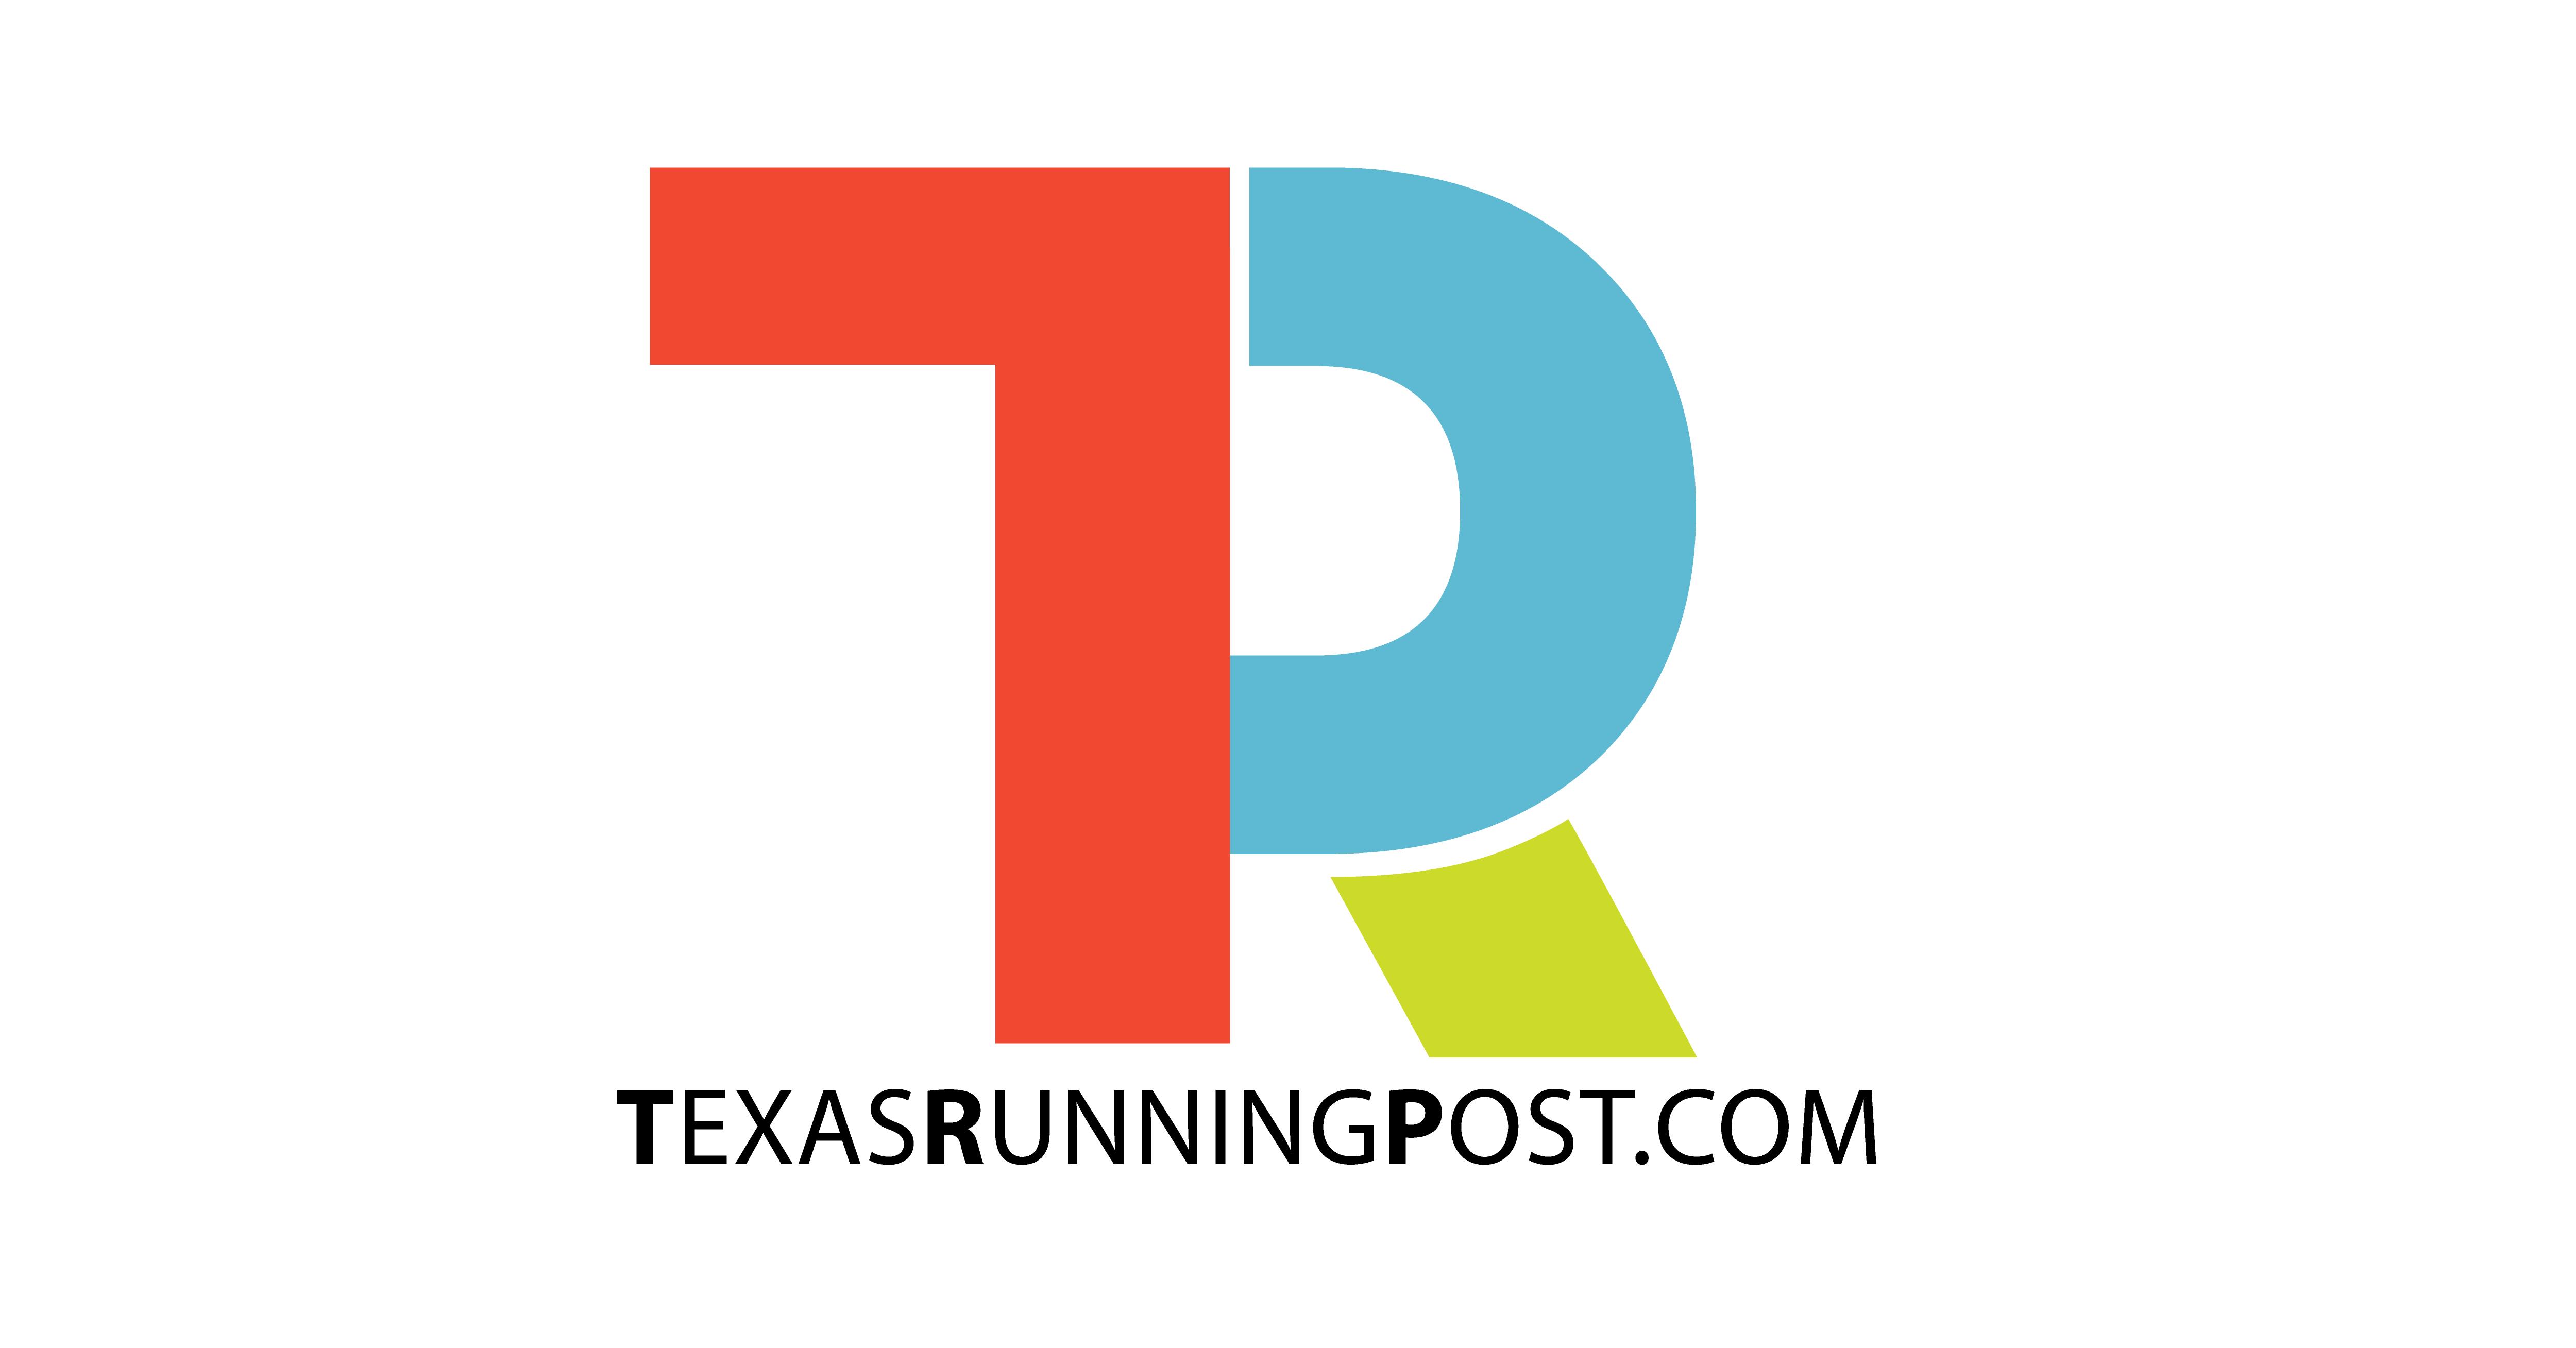 Message from TexasRunningPost.com